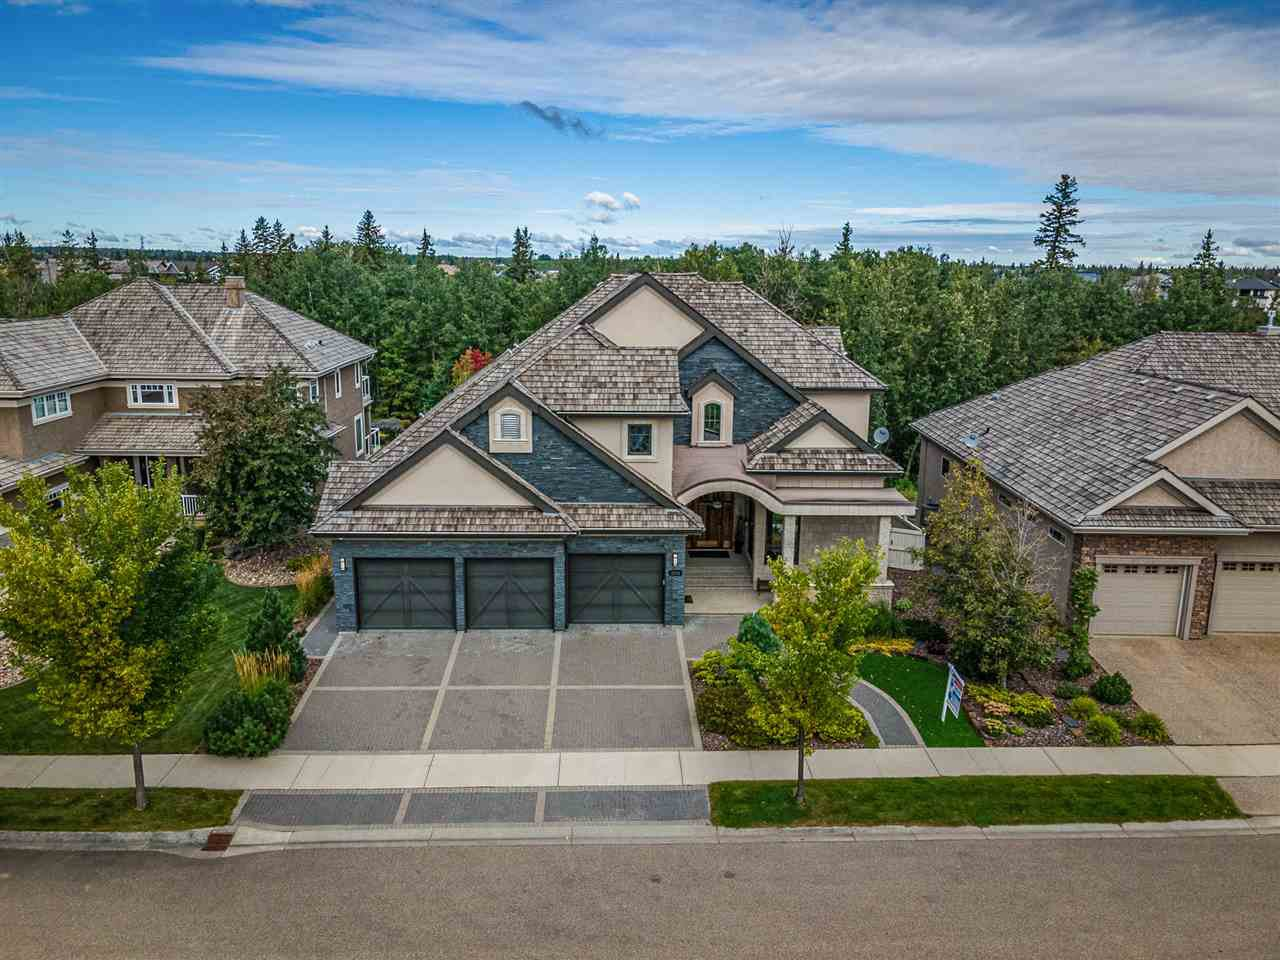 Main Photo: 2434 CAMERON RAVINE Drive in Edmonton: Zone 20 House for sale : MLS®# E4213704